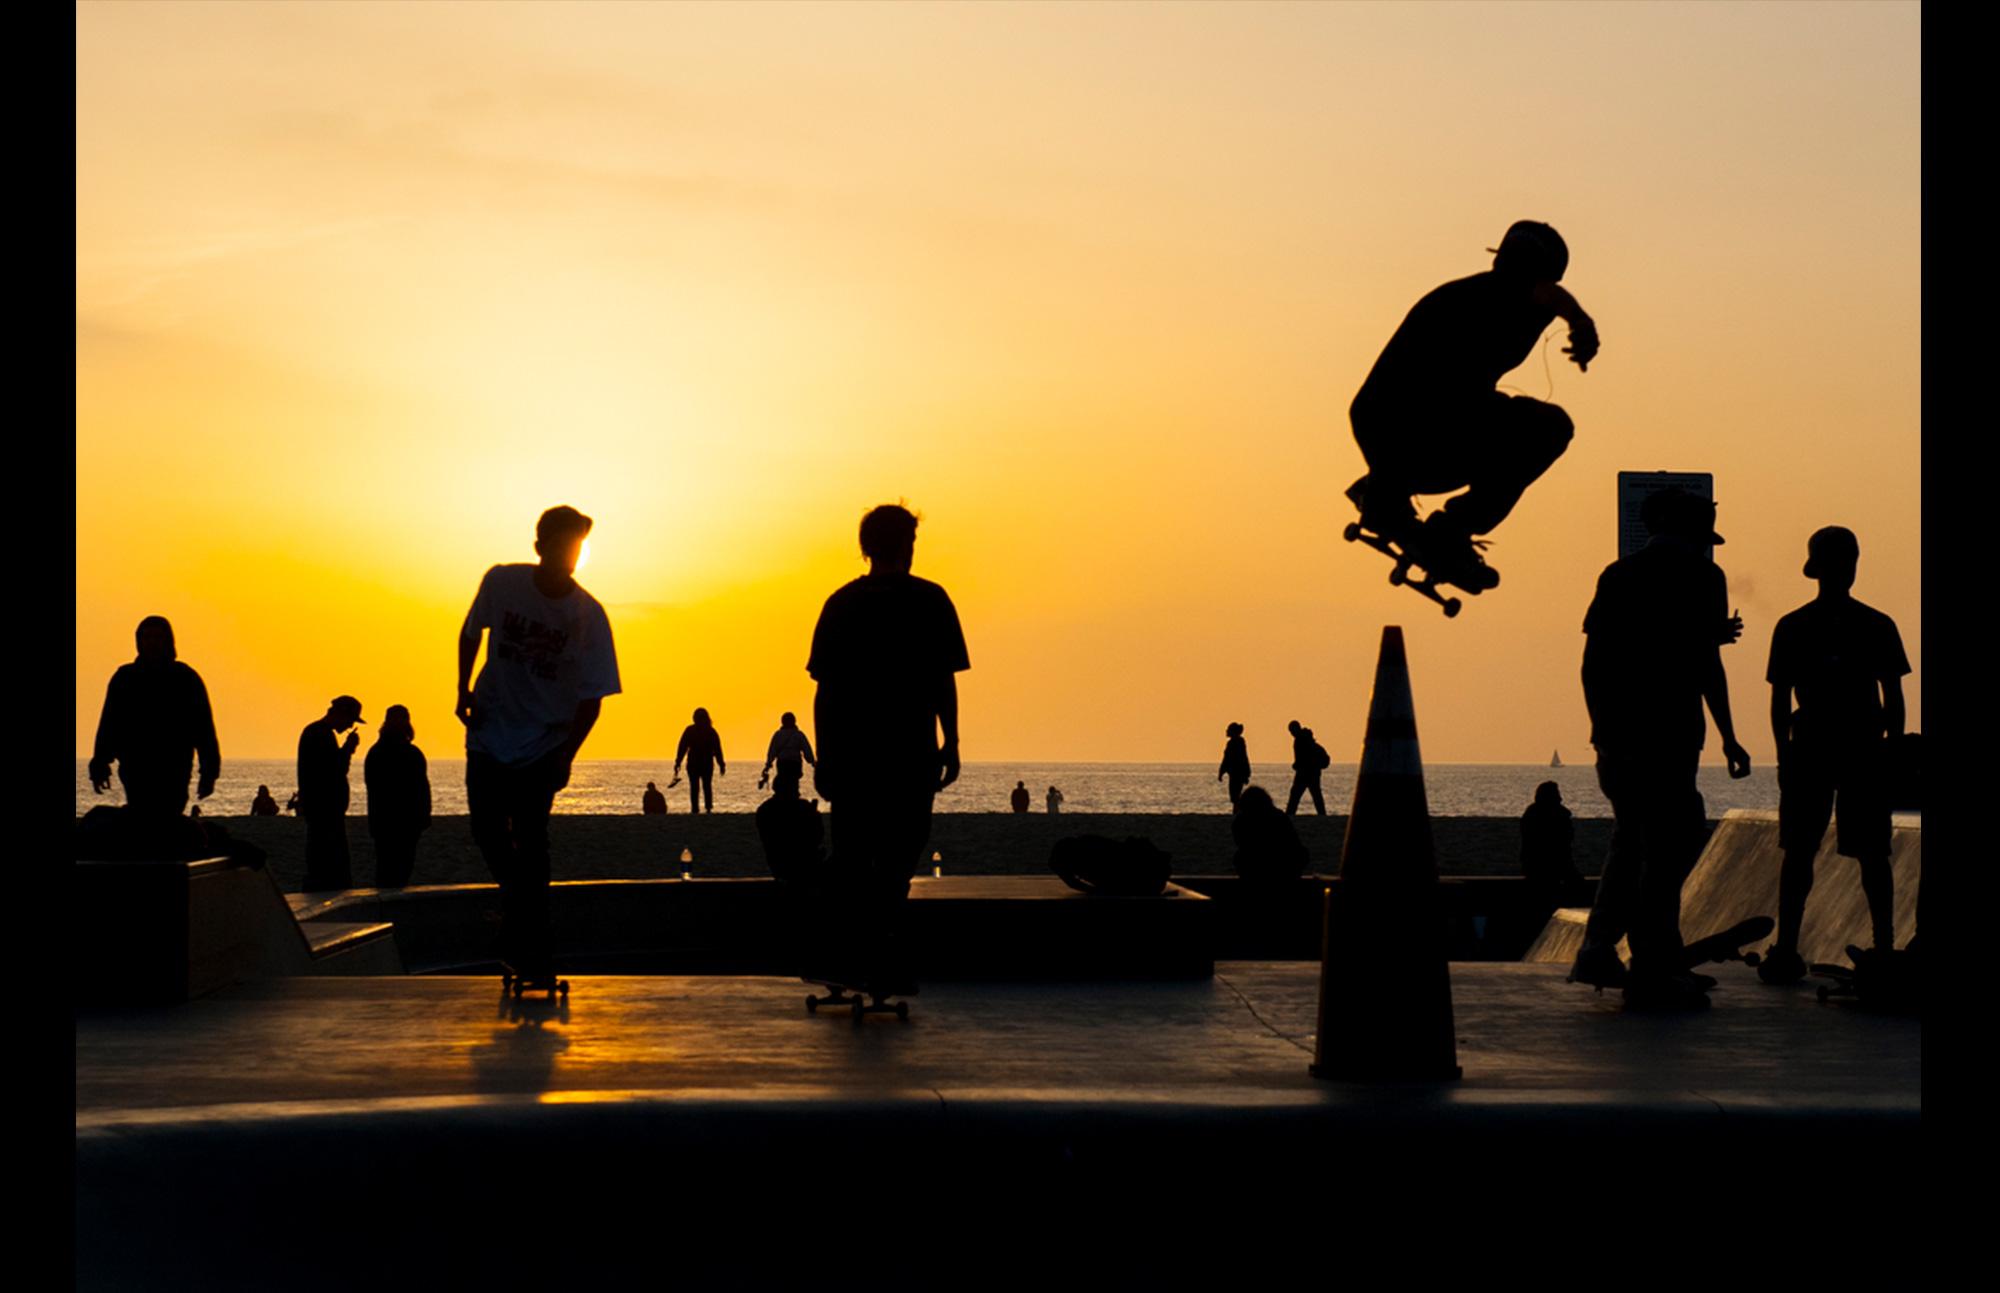 skateboarders' silhouettes